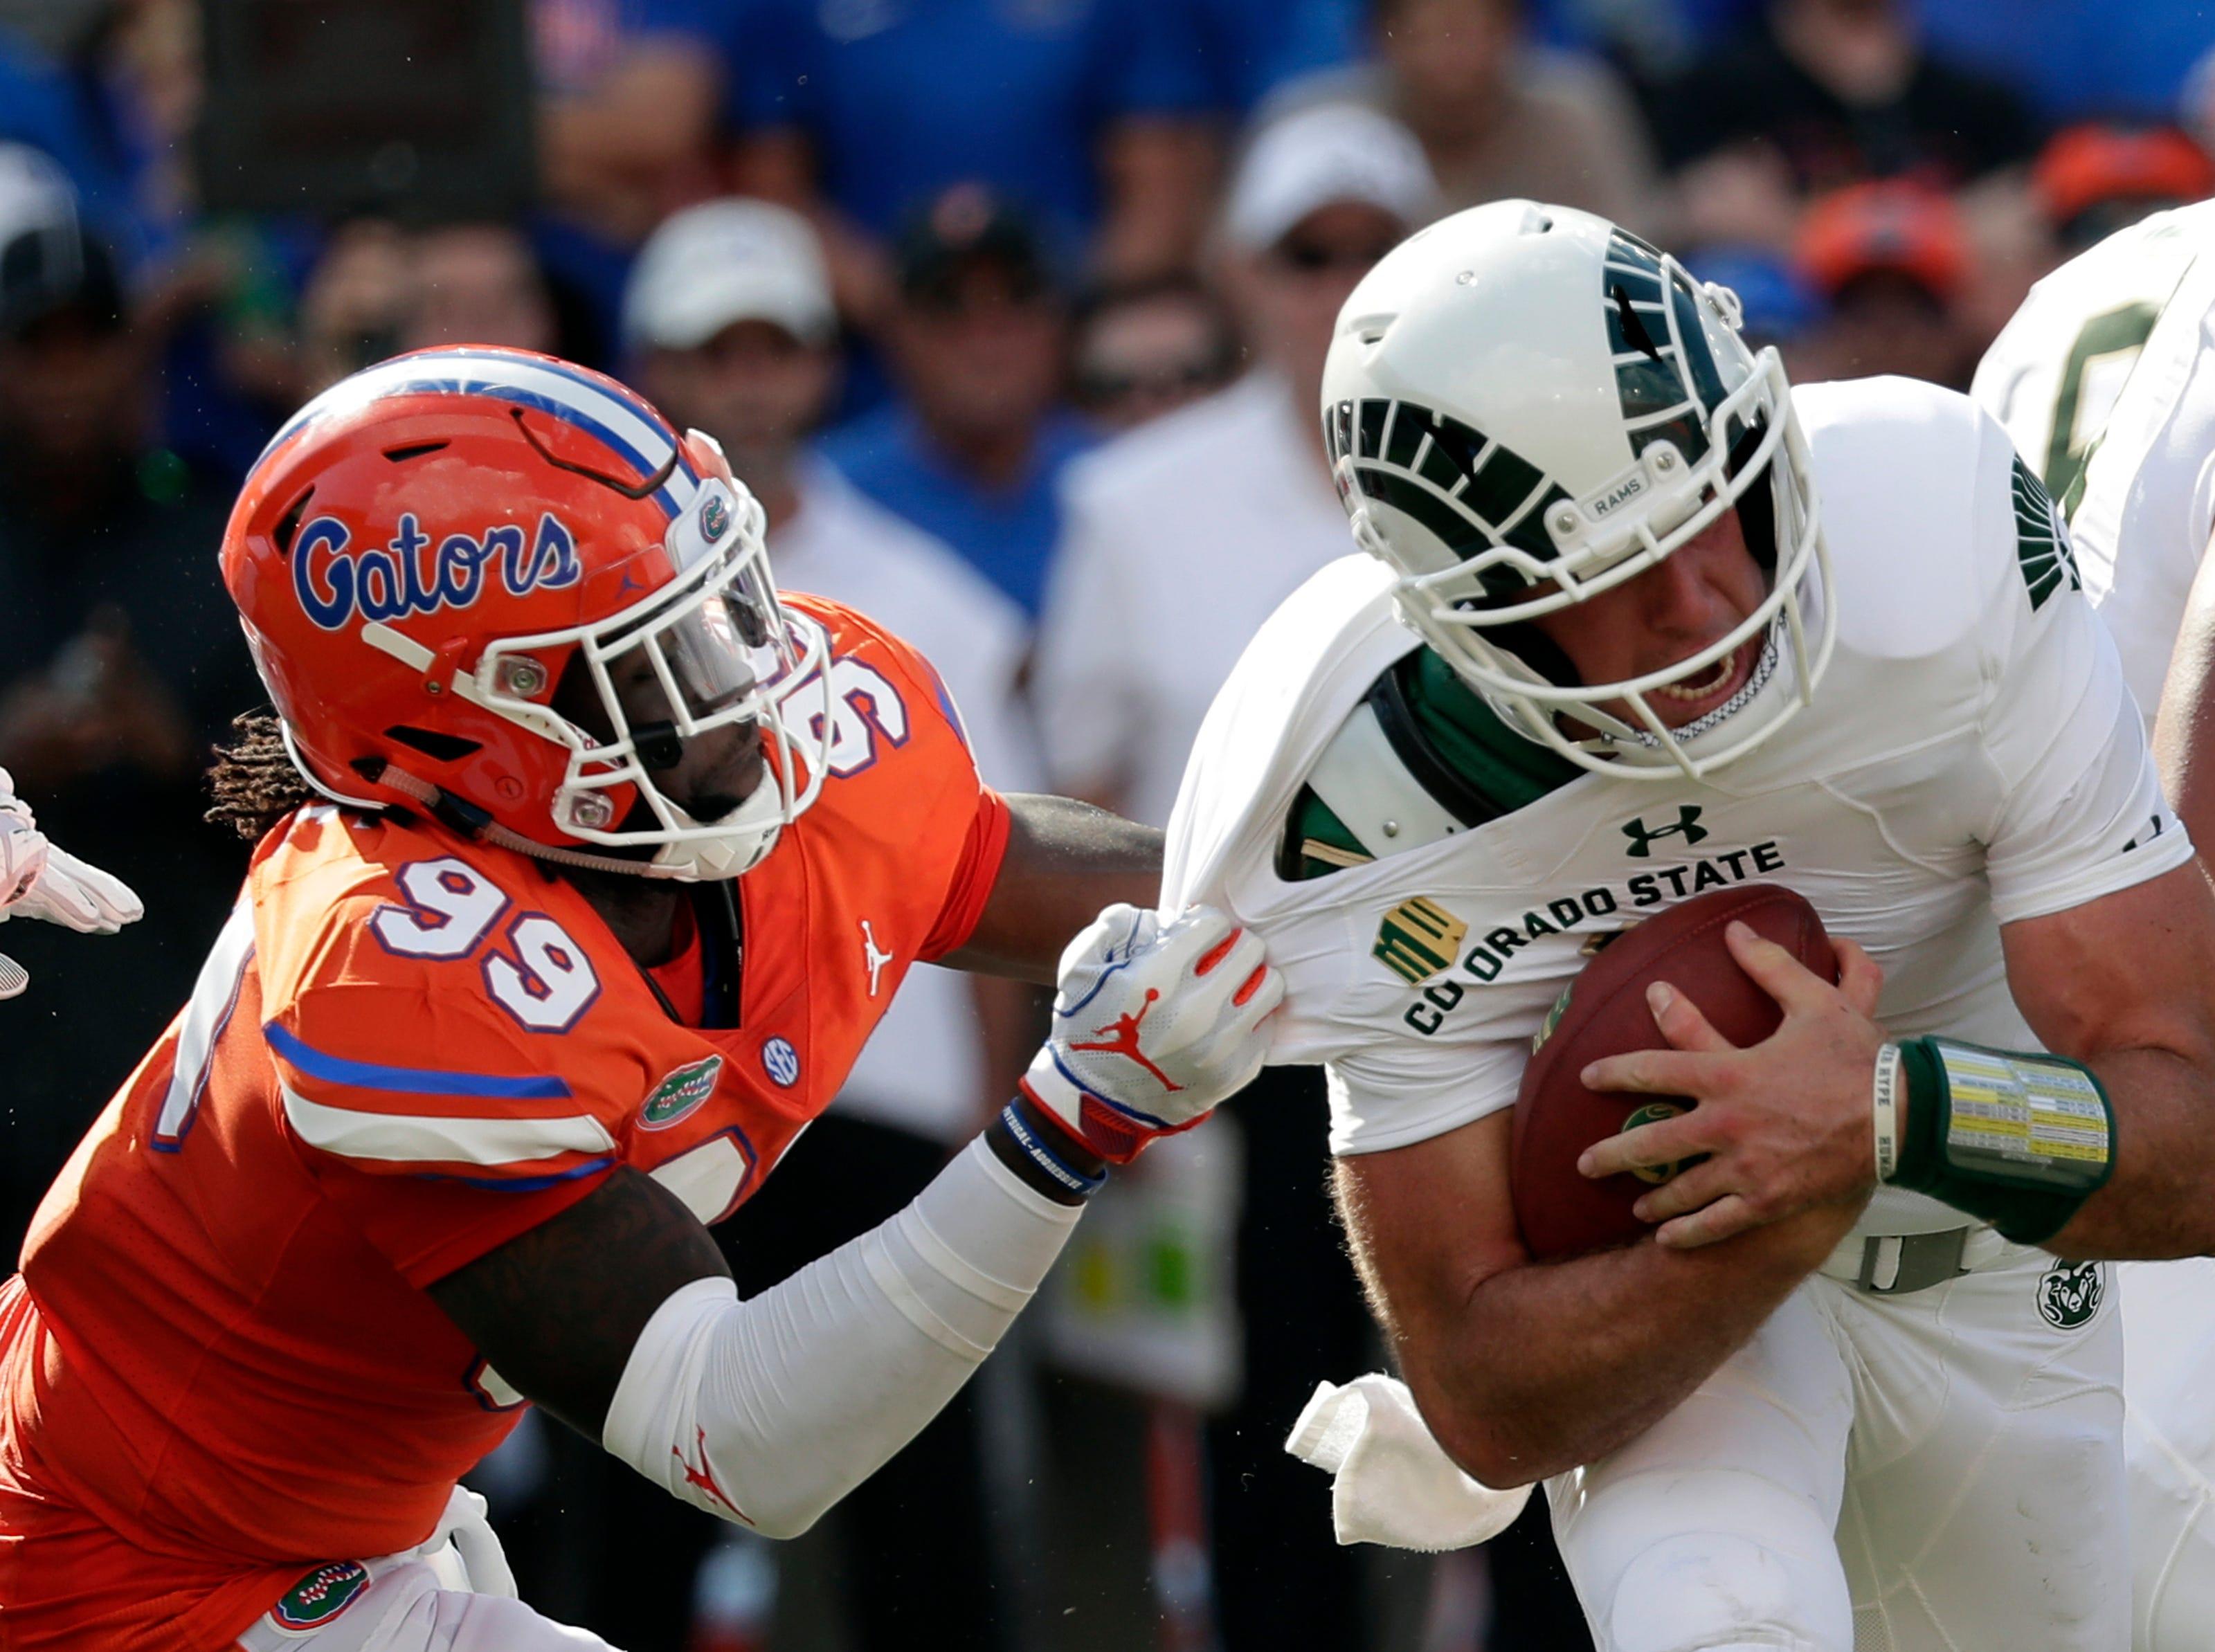 Florida defensive lineman Jachai Polite (99) sacks Colorado State quarterback K.J. Carta-Samuels during the first half of an NCAA college football game, Saturday, Sept. 15, 2018, in Gainesville, Fla.